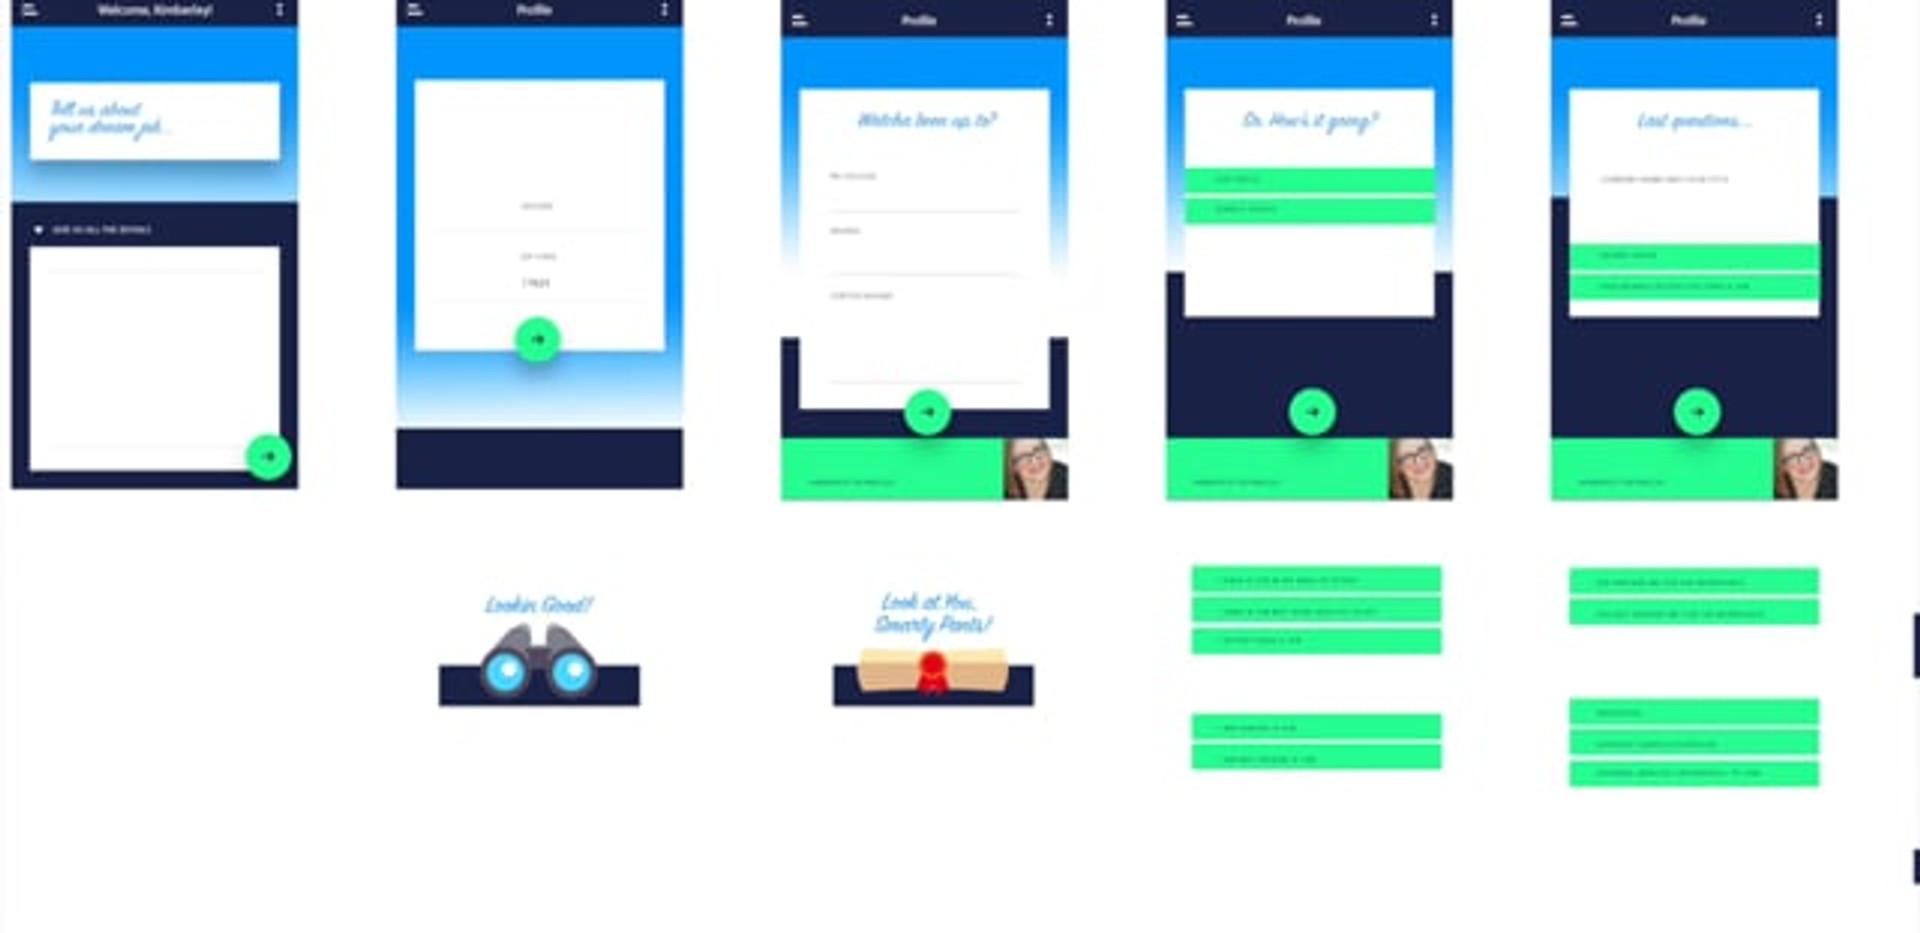 UX Design Education App